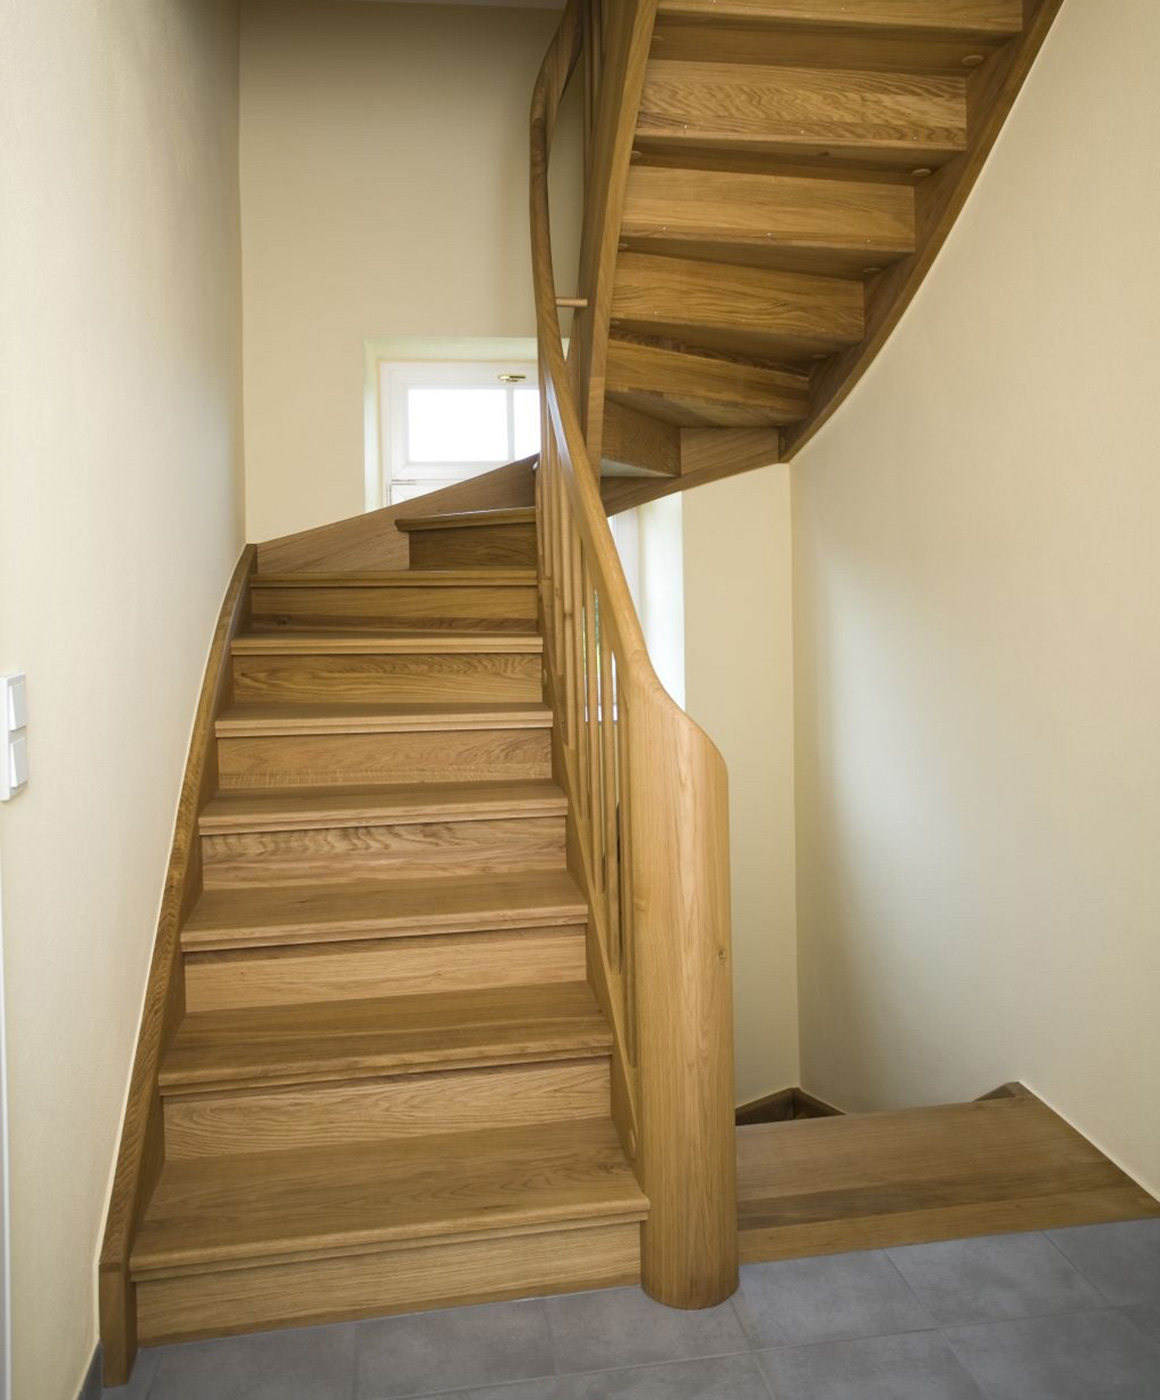 k chen tretter gmbh plz 64720 michelstadt individuelle. Black Bedroom Furniture Sets. Home Design Ideas